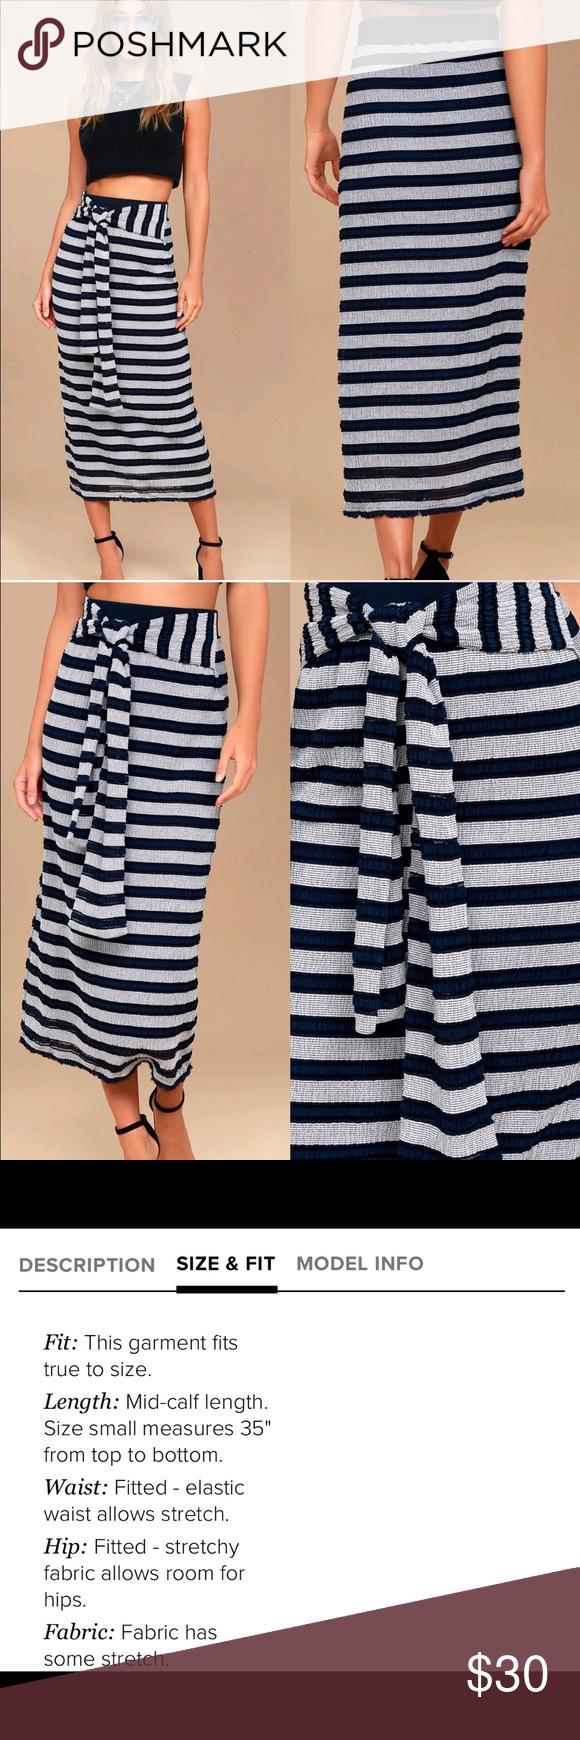 Women's Clothing 18W Women's Skirts NWT Terra & Sky Womens Plus Knit Maxi Navy White Stripe Skirt Size 1X 16W